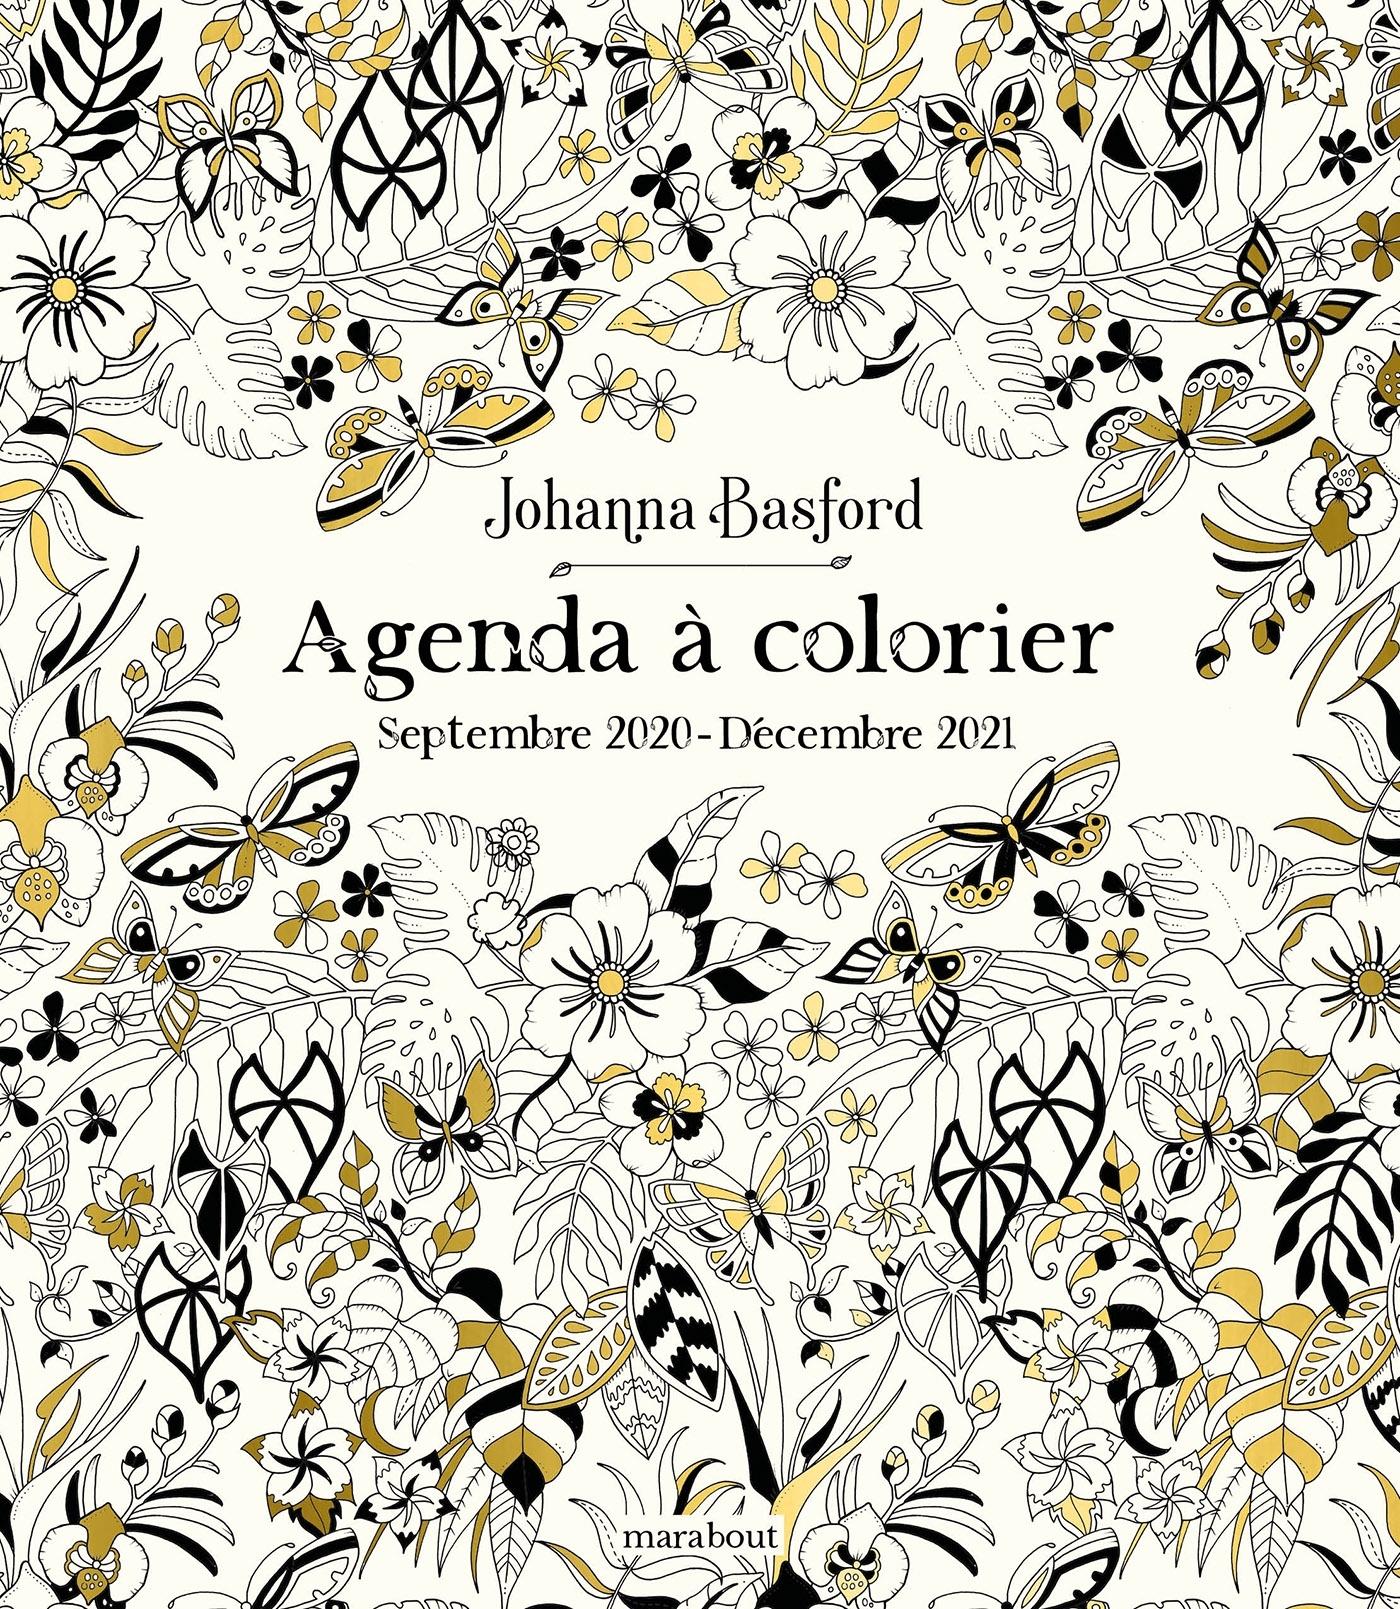 AGENDA A COLORIER 2021 - JOHANNA BASFORD